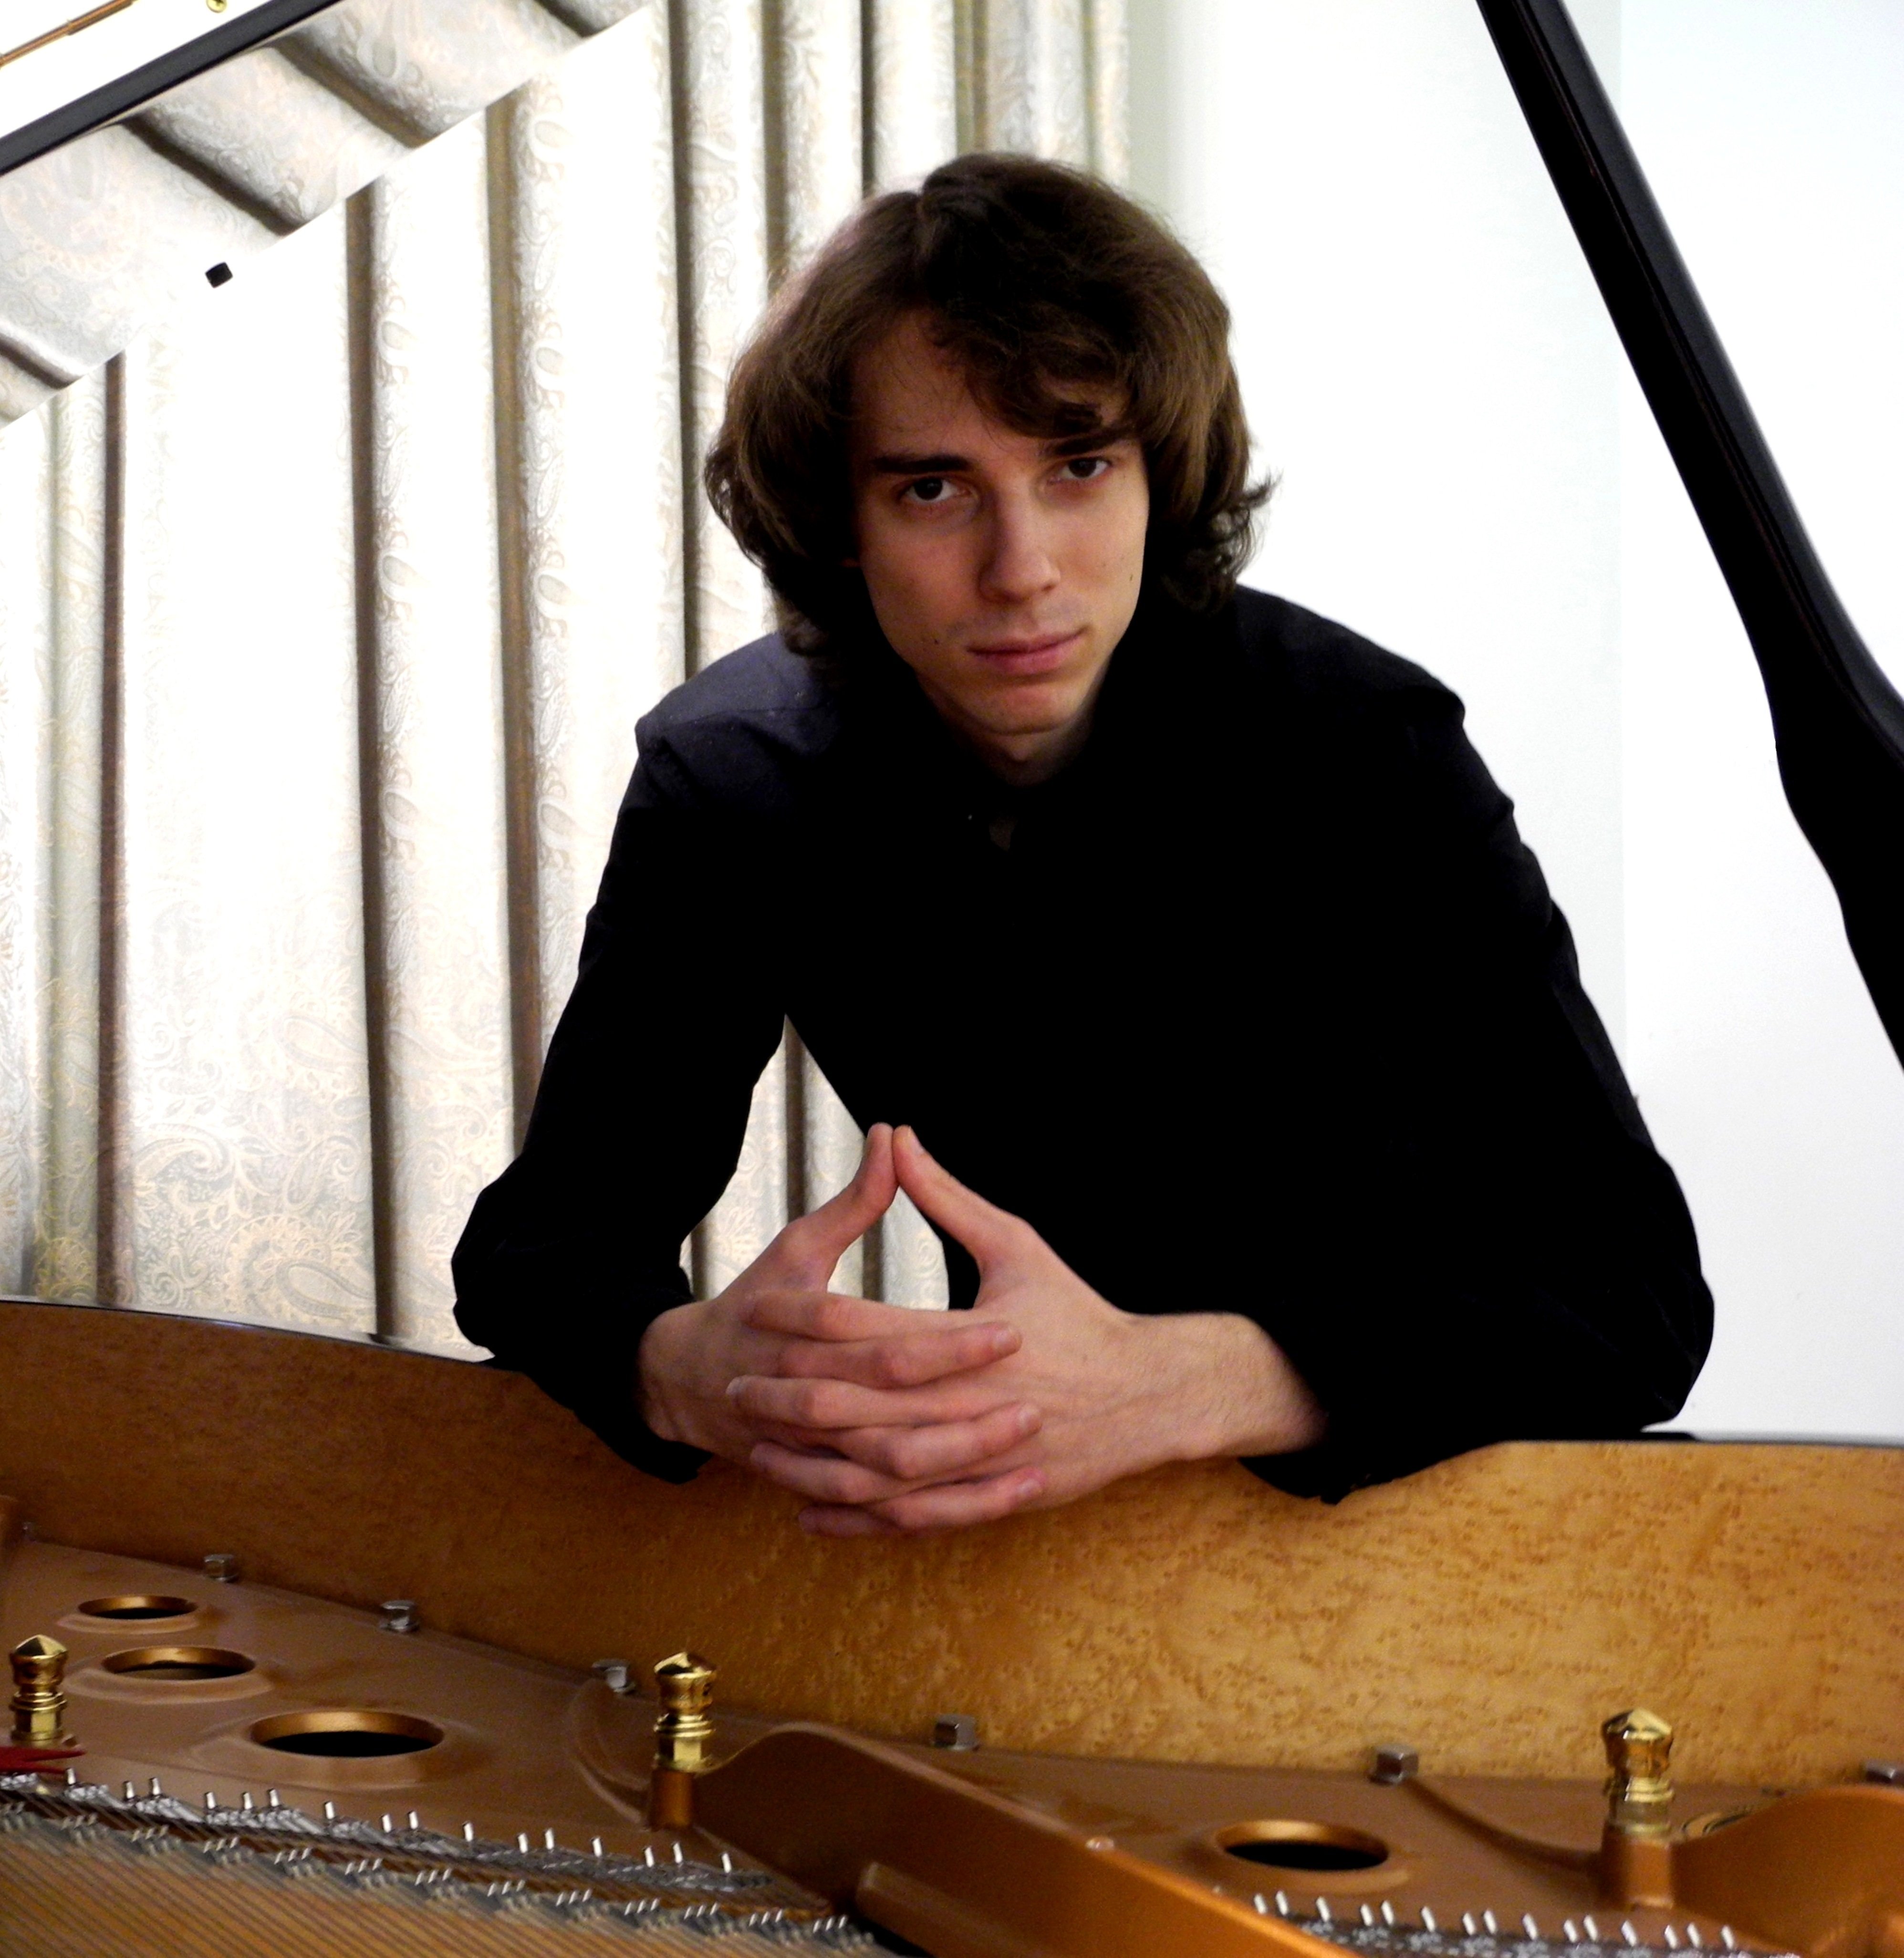 Andrei Bulatov